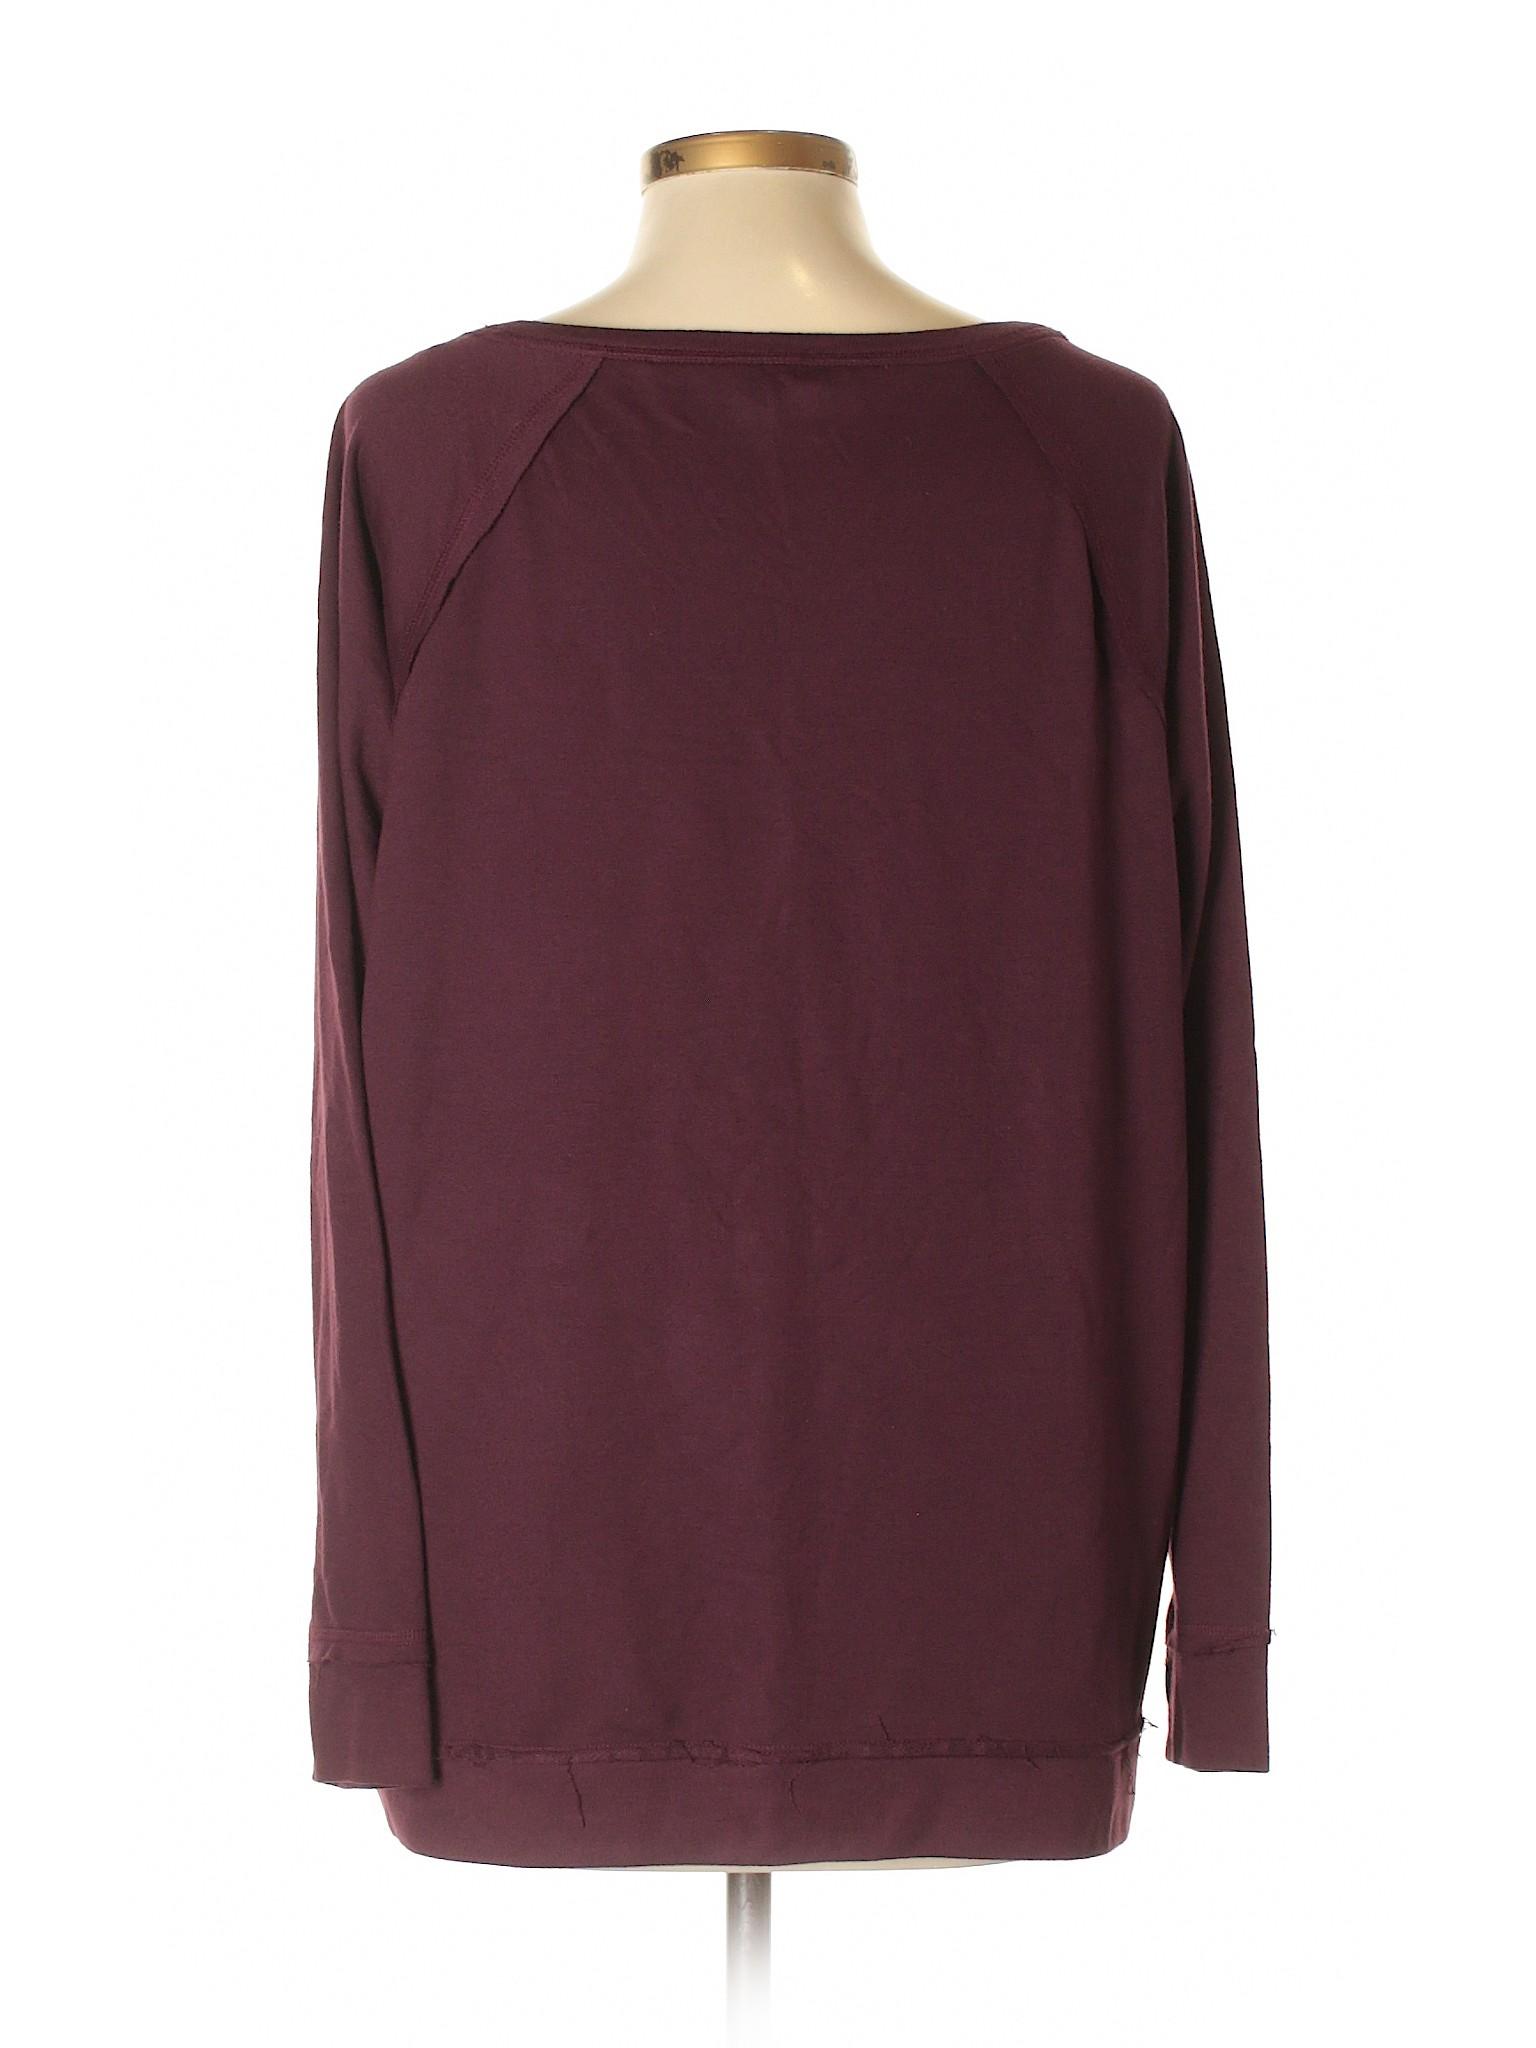 amp; winter Boutique Sweater Republic Rock Pullover qBECP